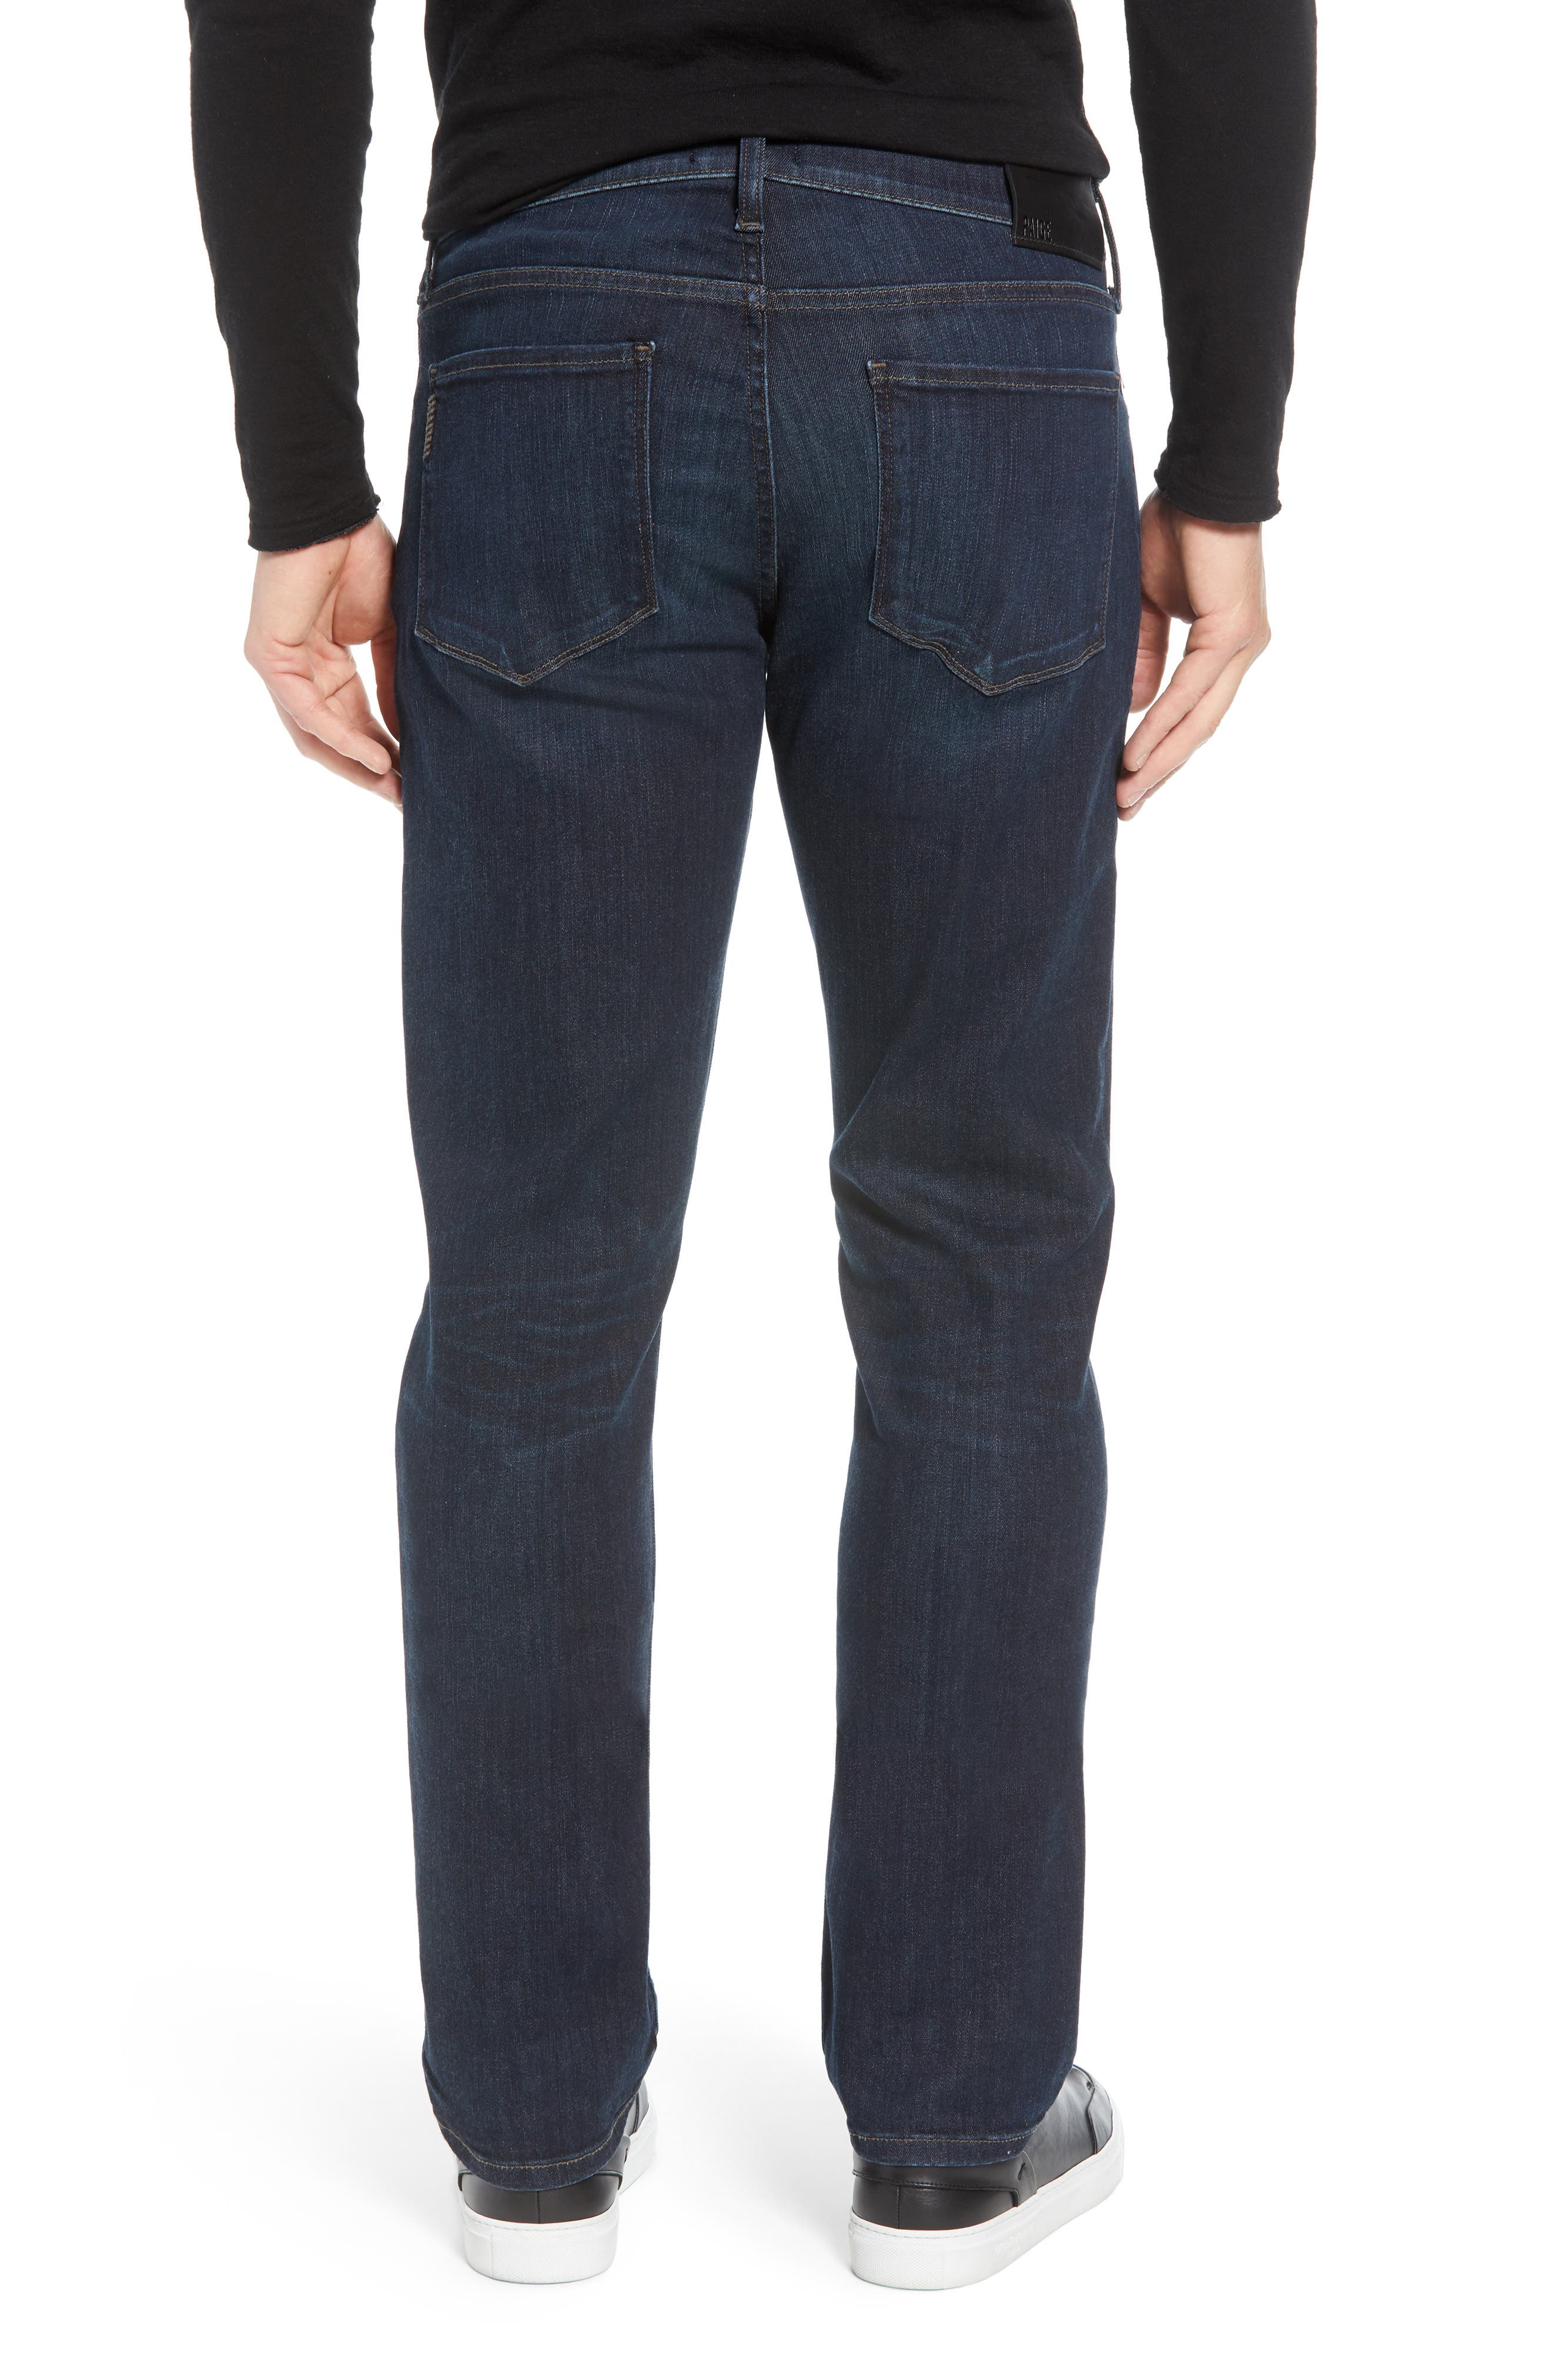 Transcend - Normandie Straight Leg Jeans,                             Alternate thumbnail 2, color,                             KENAN